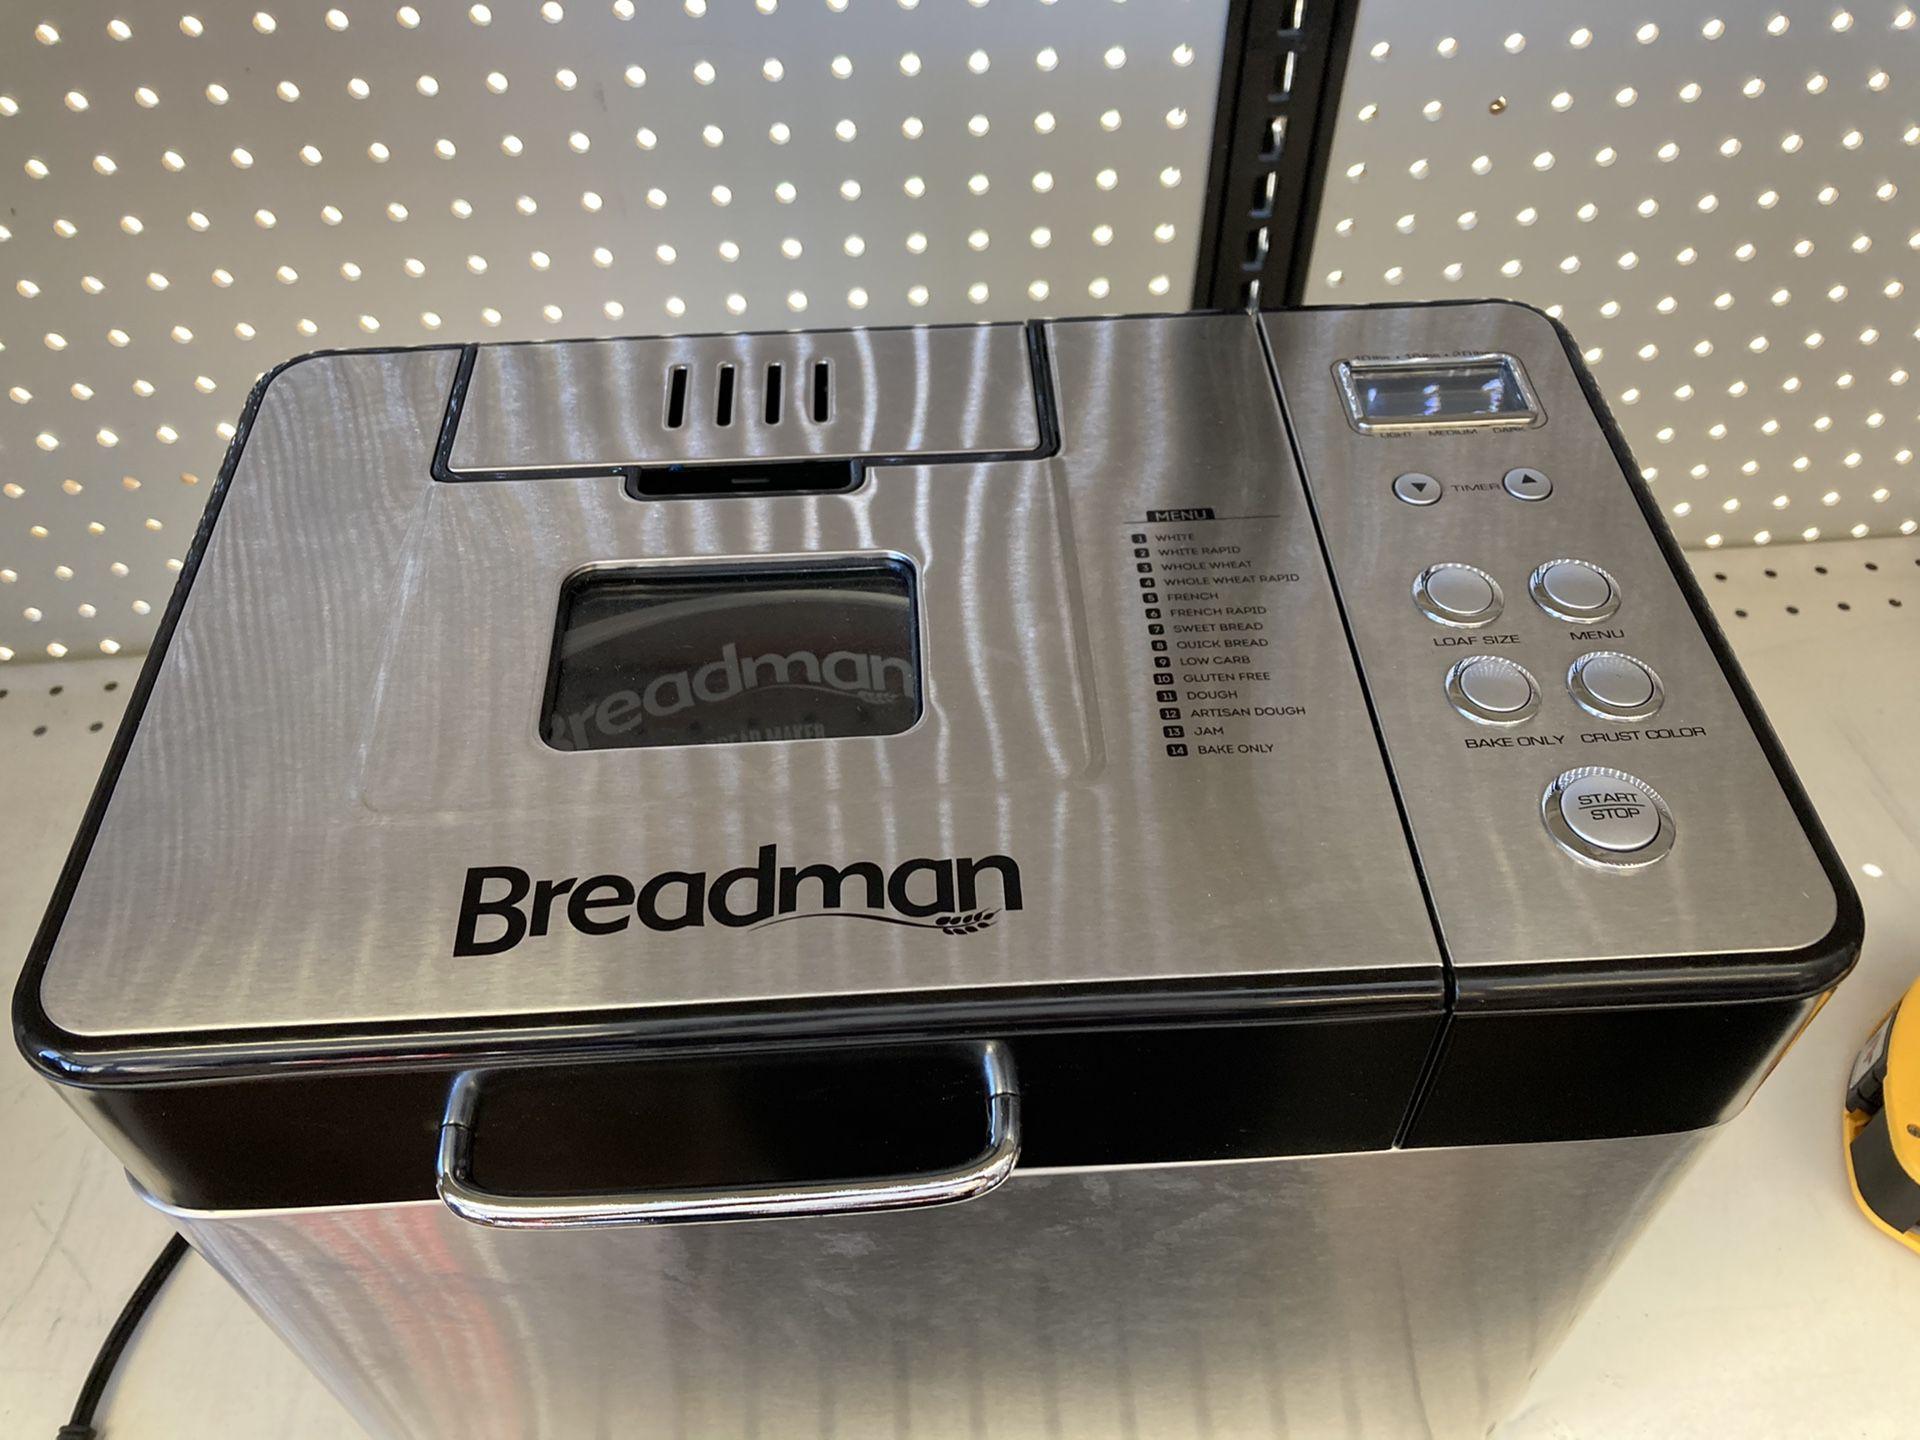 Breadman 2 lb Professional Bread Maker, Stainless Steel, BK1050S